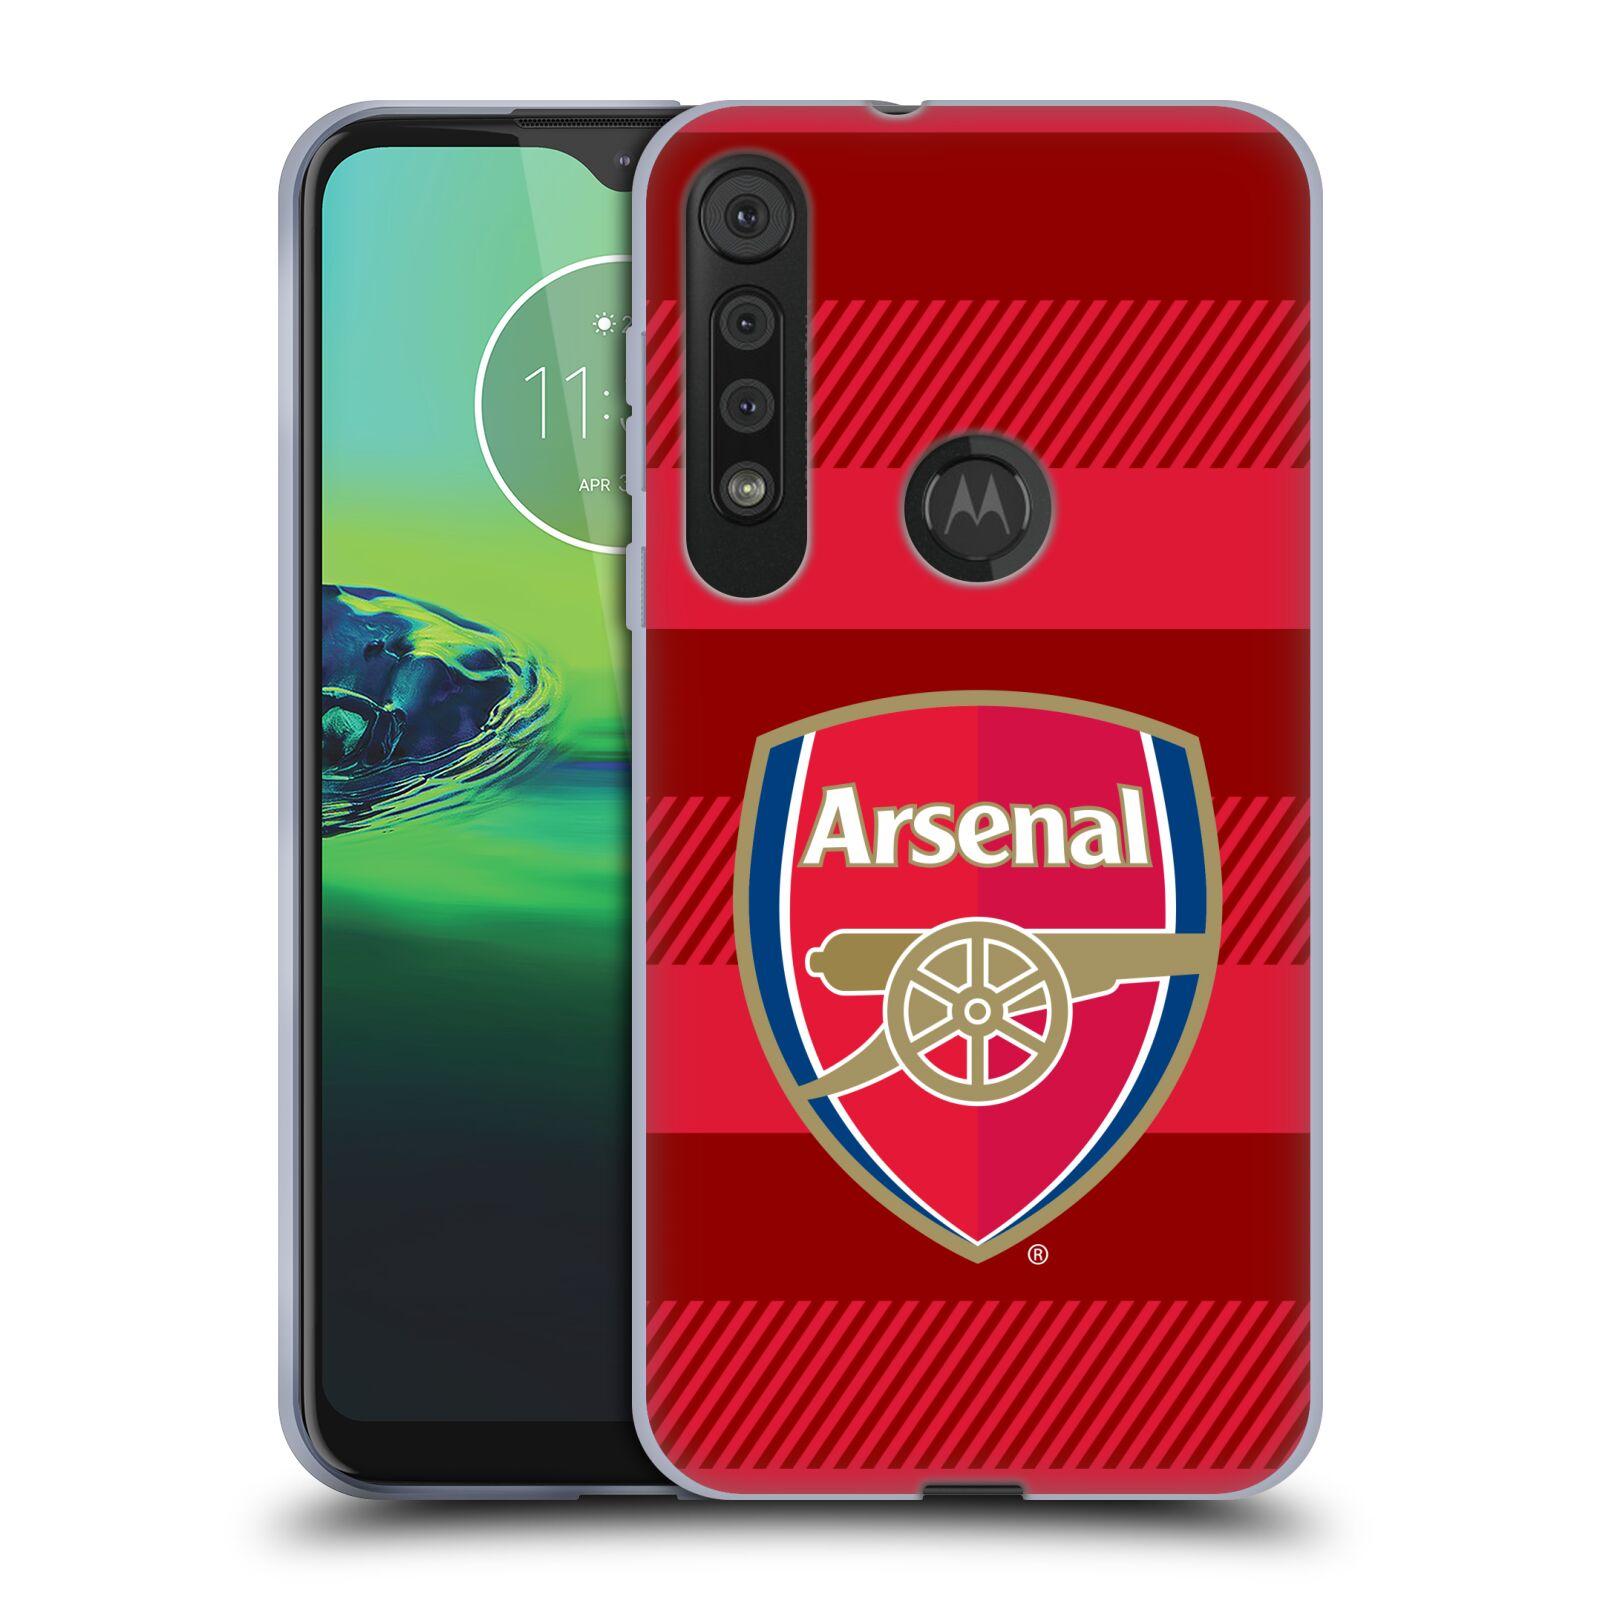 Silikonové pouzdro na mobil Motorola One Macro - Head Case - Arsenal FC - Logo s pruhy